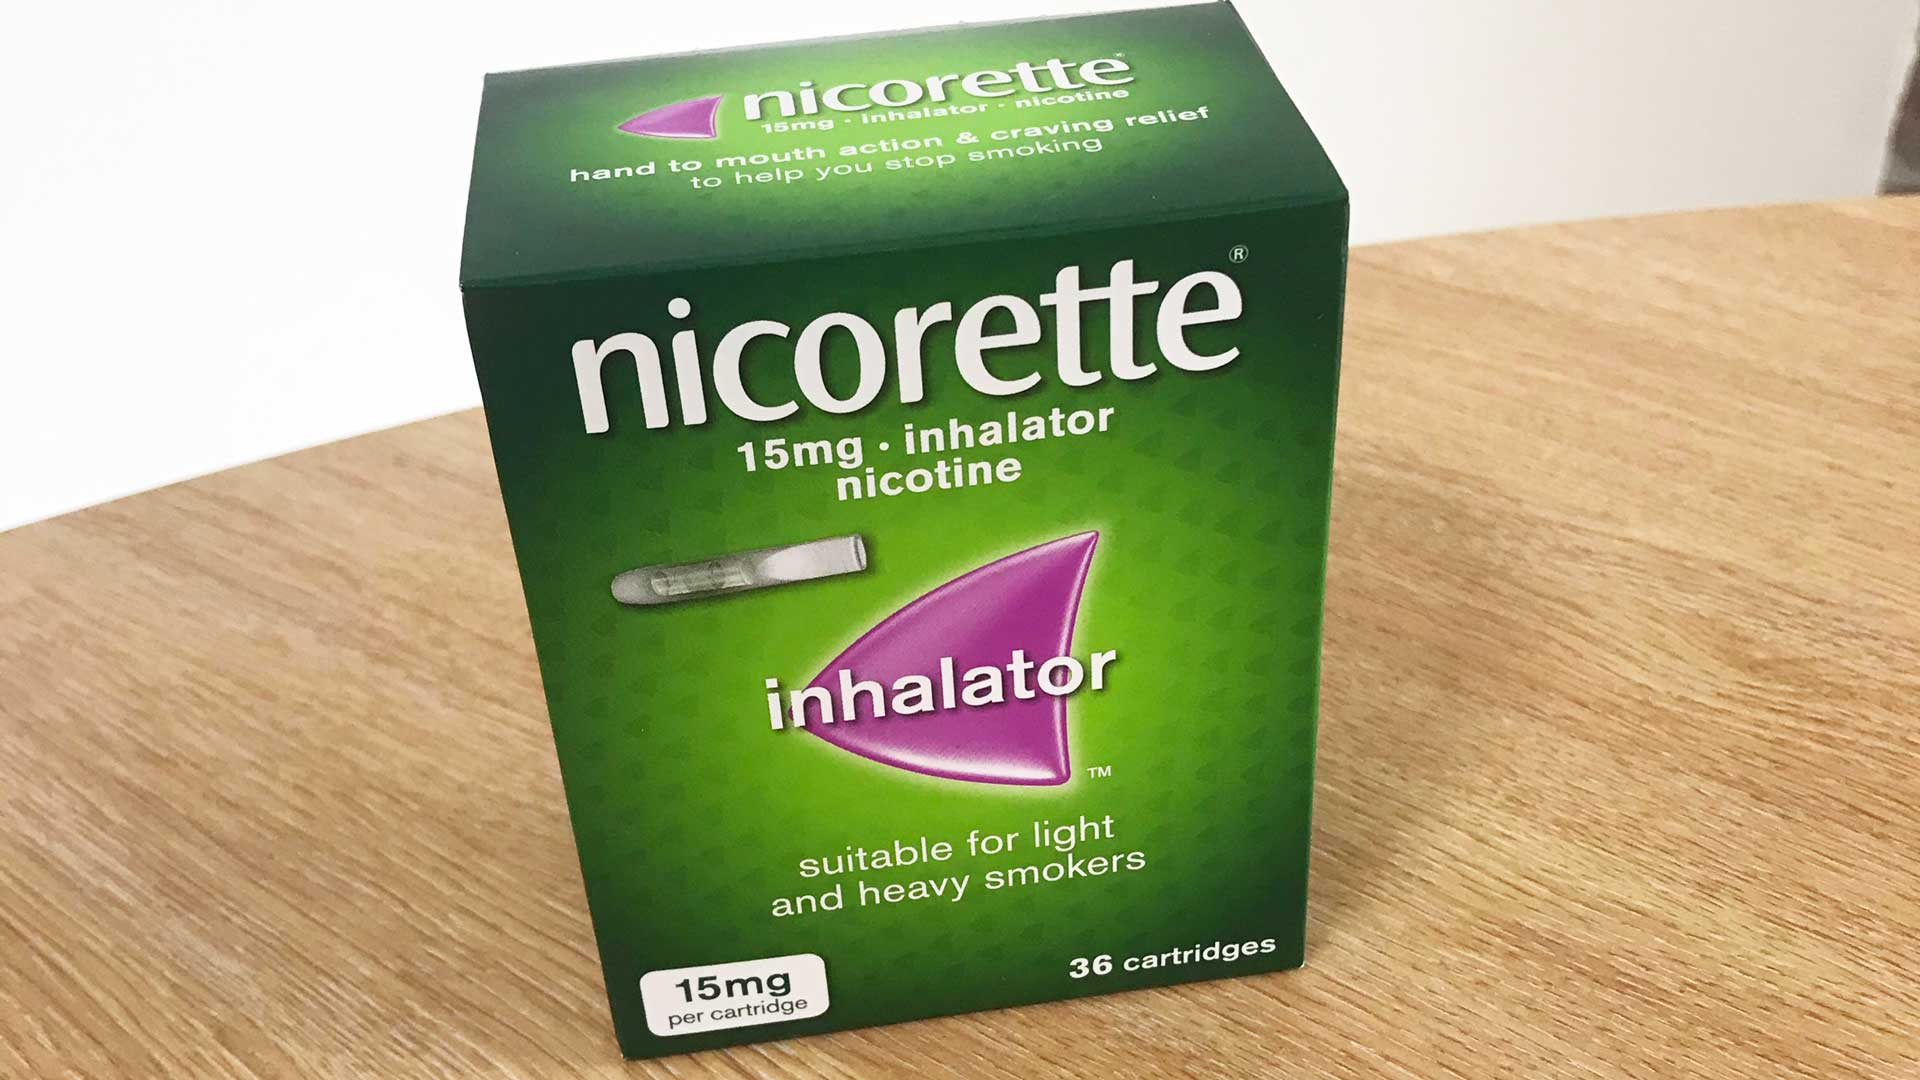 Photo of a nicorette inhalator